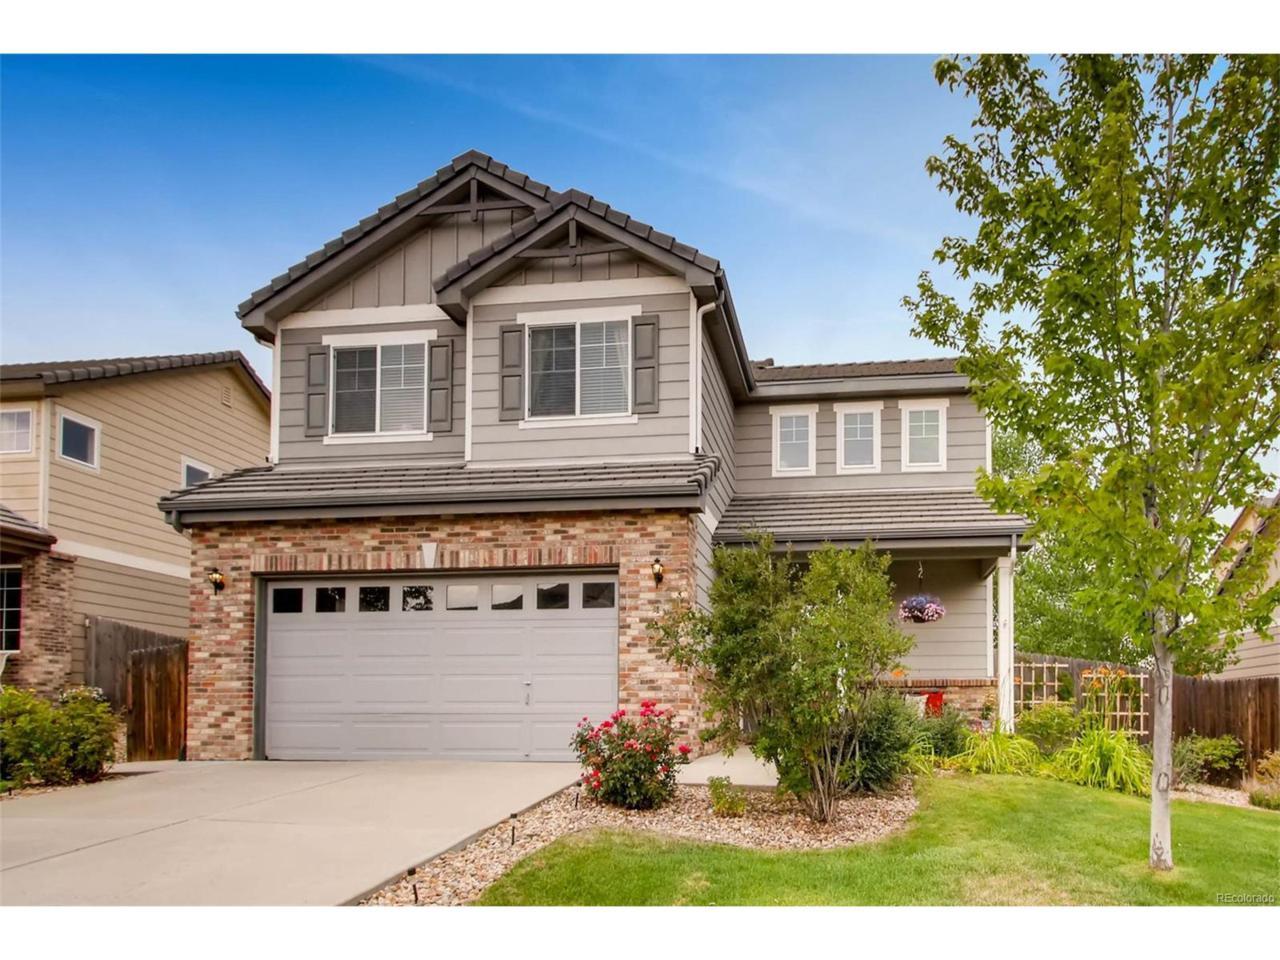 12951 Syracuse Street, Thornton, CO 80602 (MLS #1552397) :: 8z Real Estate